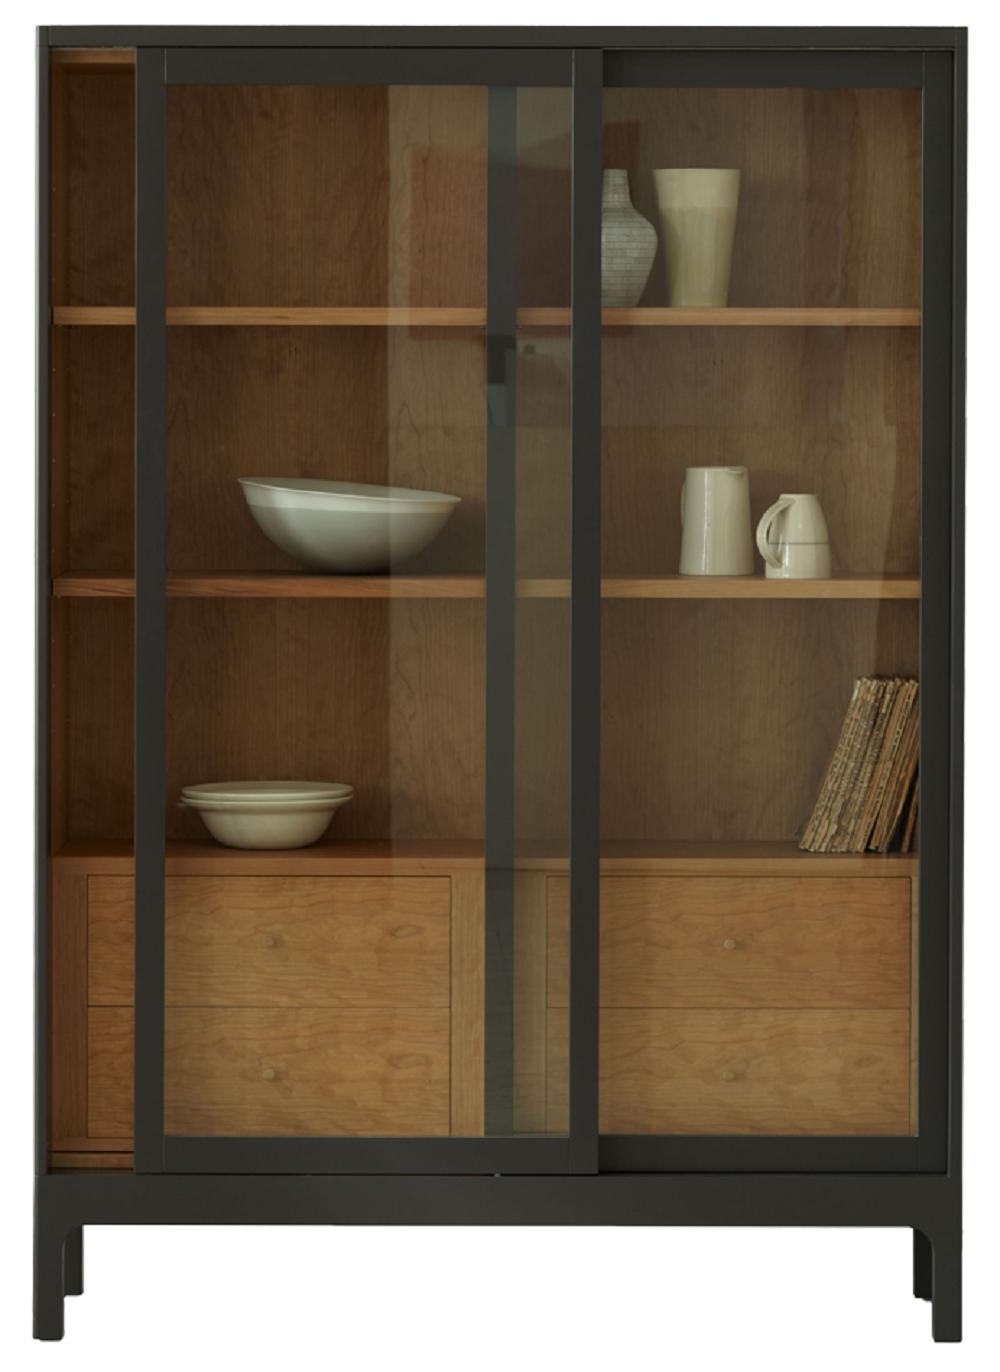 Conran Shop Joyce Cabinet Furniture Cabinet Styles Furniture